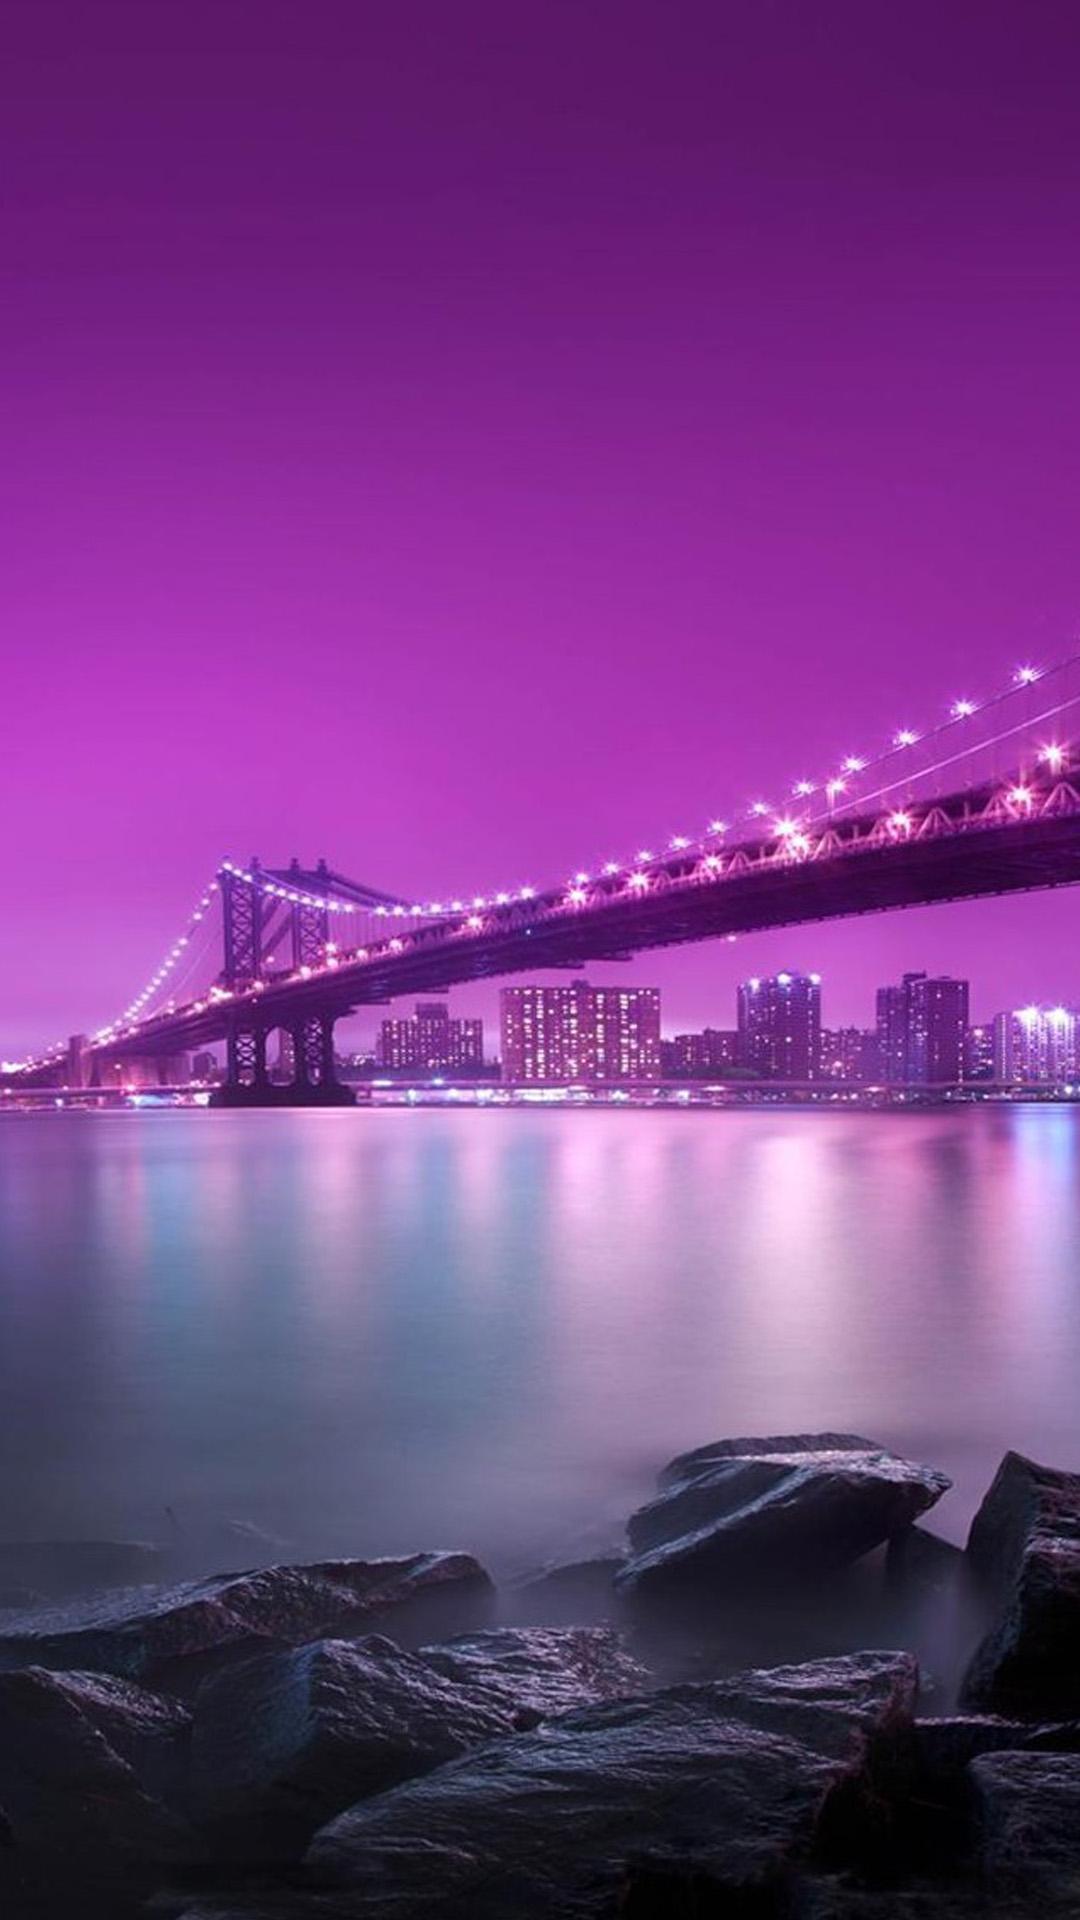 Pont Illumine Nuit Mobile Wallpaper Fond Ecran Hd